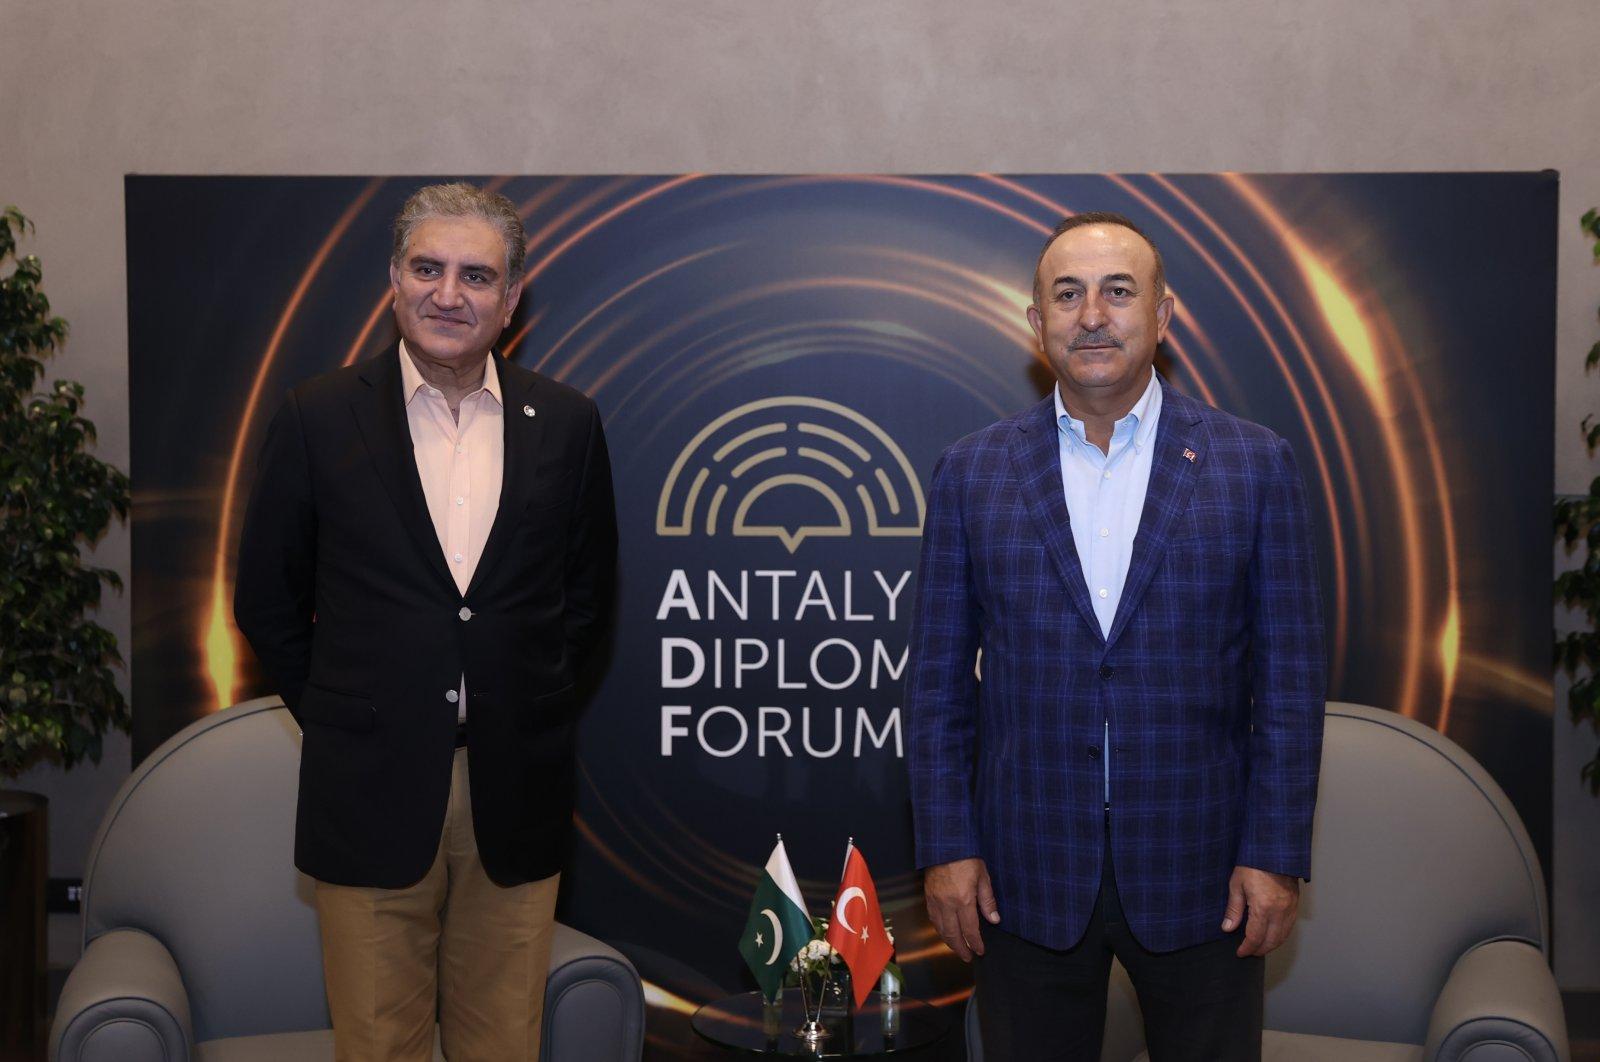 Pakistan's Foreign Minister Shah Mahmood Qureshi (L) and Foreign Minister Mevlüt Çavuşoğlu at the Antalya Diplomacy Forum, June 20, 2021 (AA Photo)